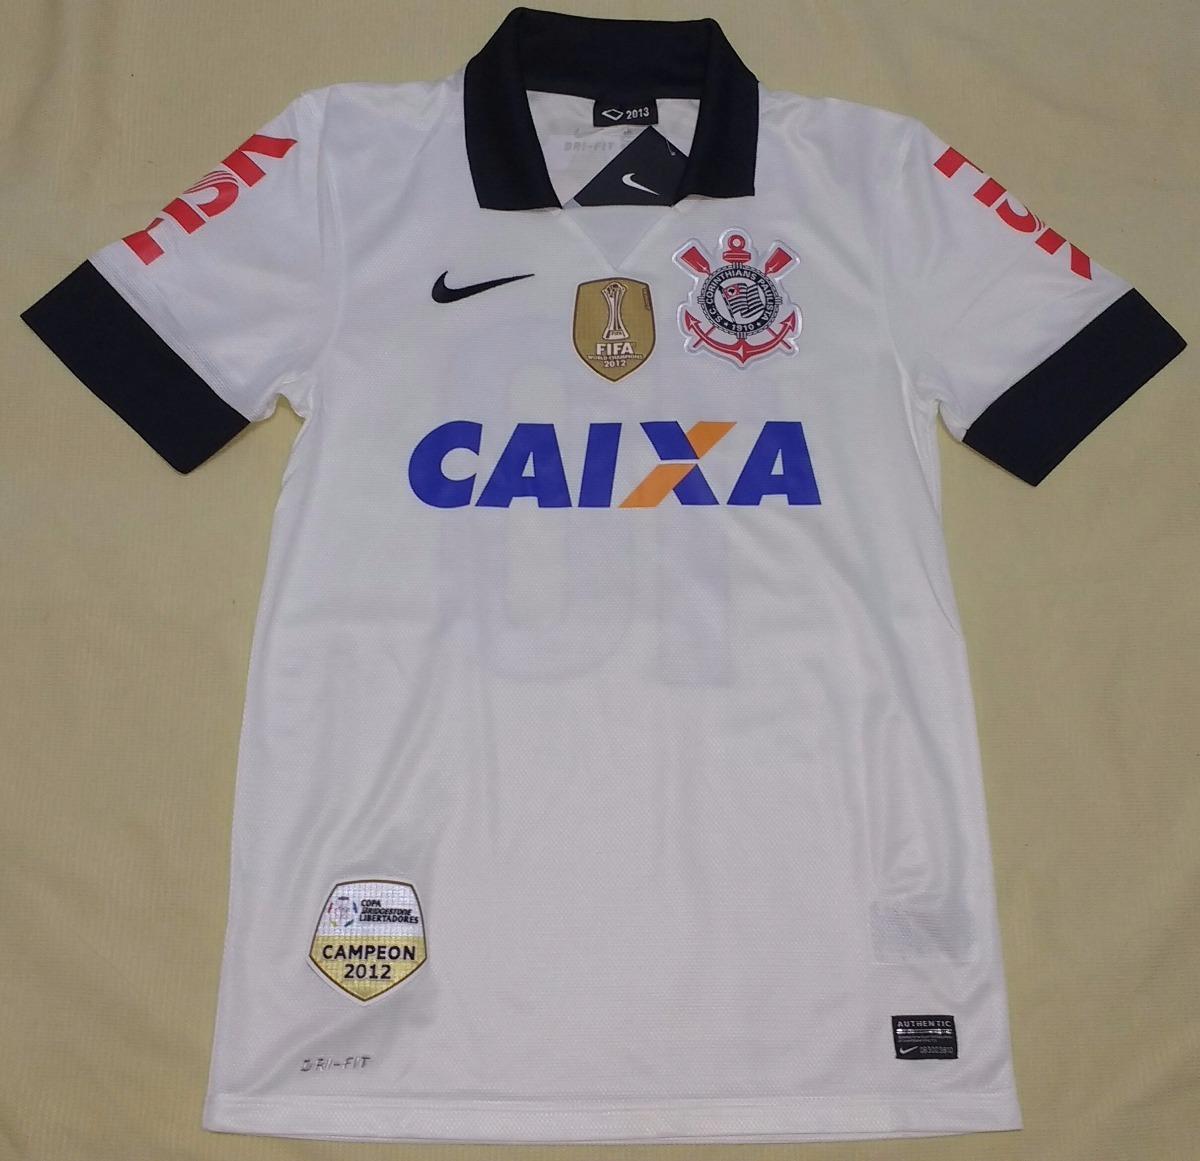 238a74b84c900 Camisa Corinthians Nike 2013 Patchs Mundial E Libertadores - R  329 ...